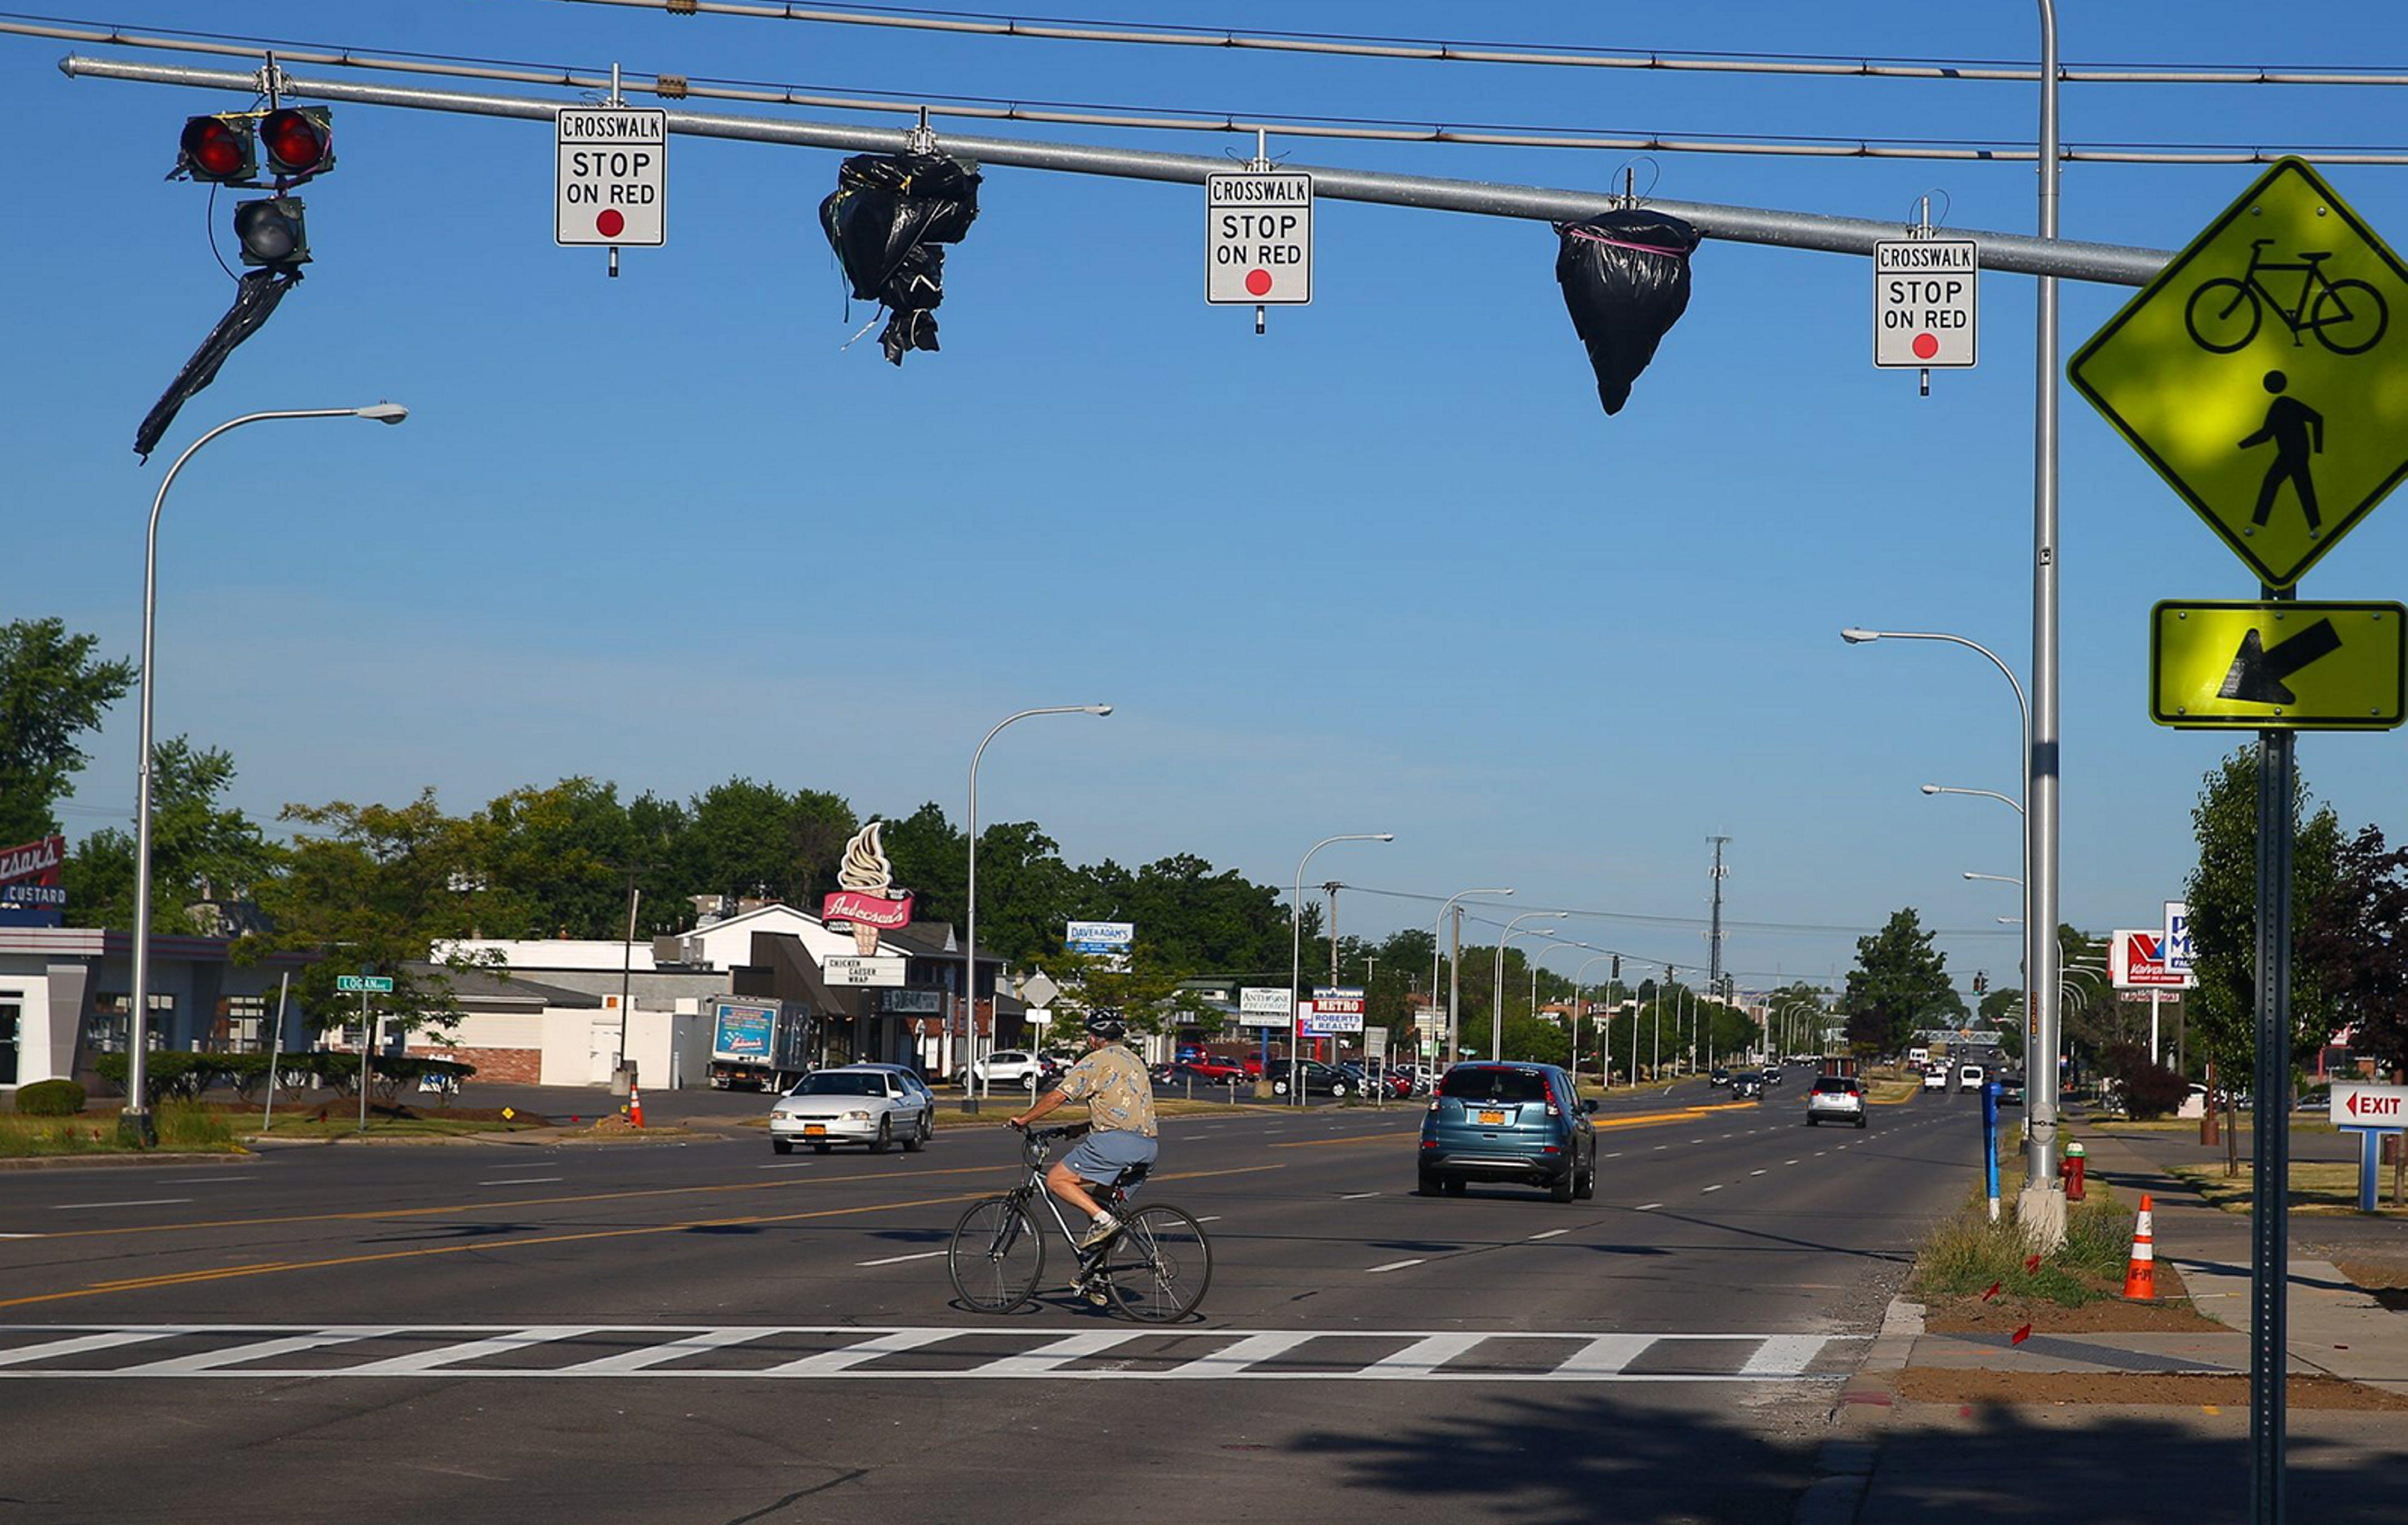 The High-intensity Activated crossWalK (HAWK) signal at Rails to Trails crossing at Sheridan Drive in Town of Tonawanda. (John Hickey/Buffalo News)